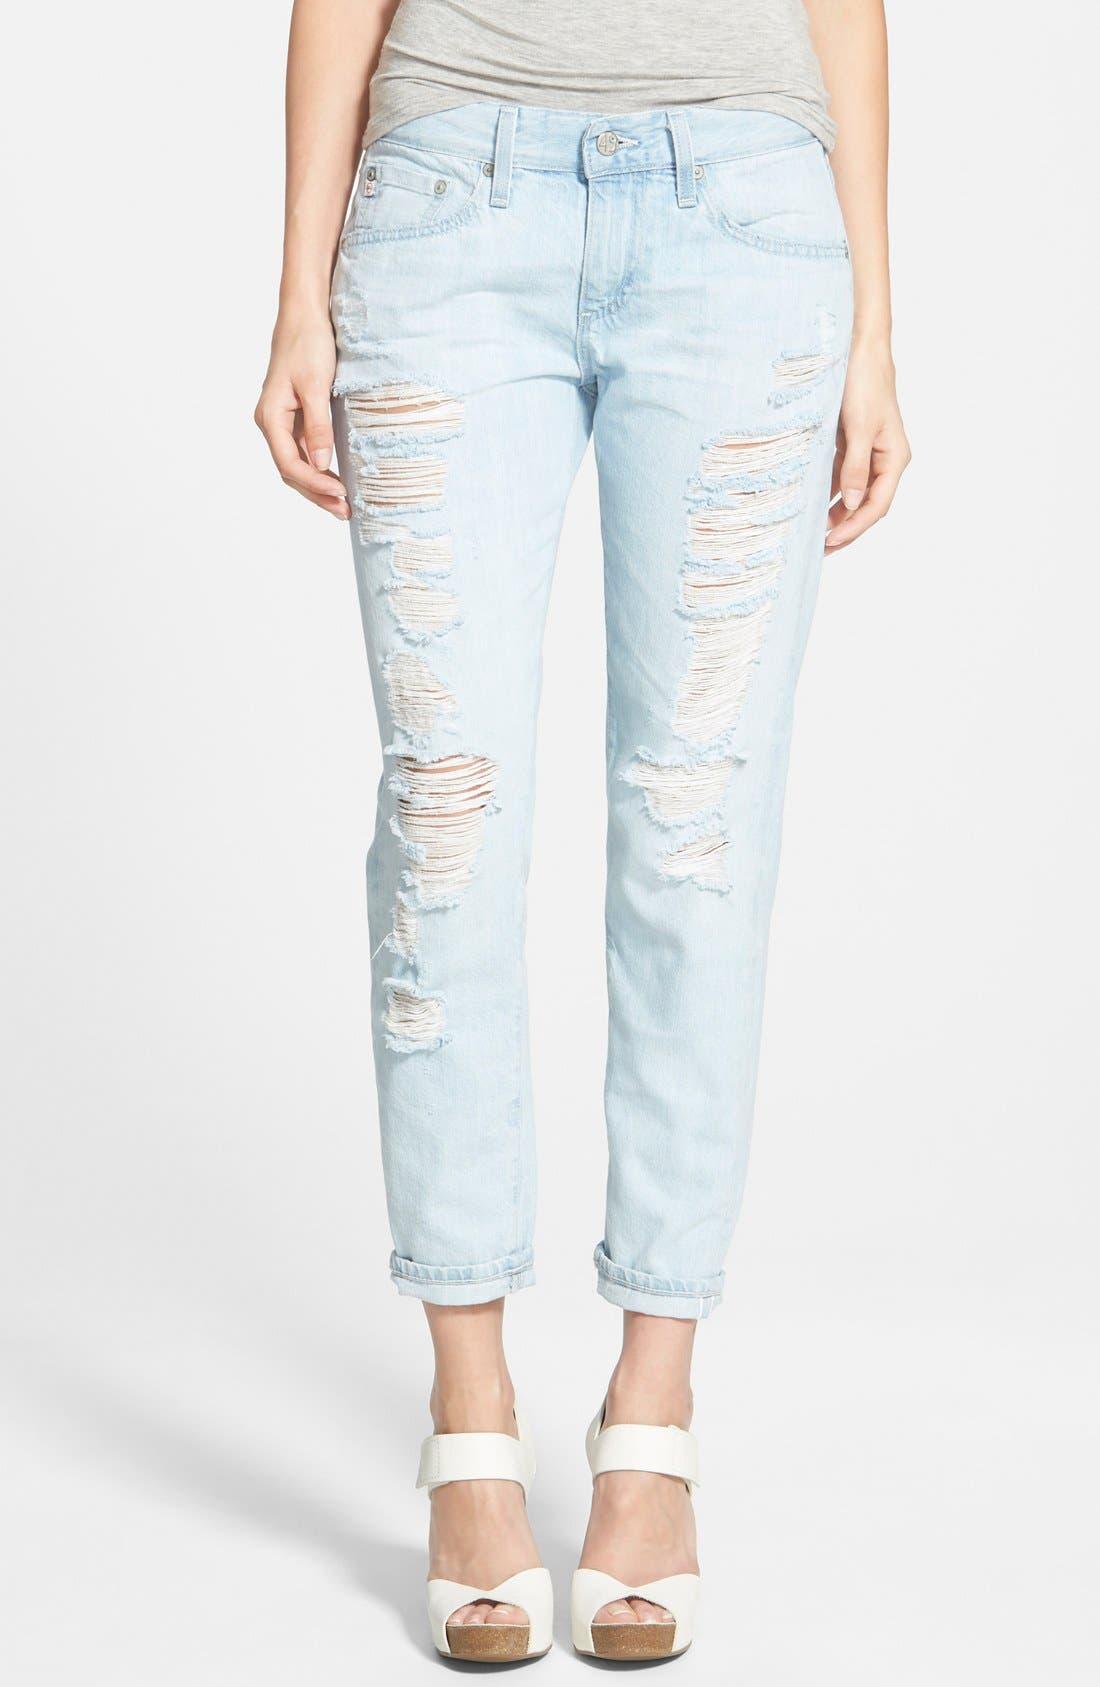 Alternate Image 1 Selected - AG 'Nikki' Relaxed Skinny Crop Jeans (28 Years Shredded)